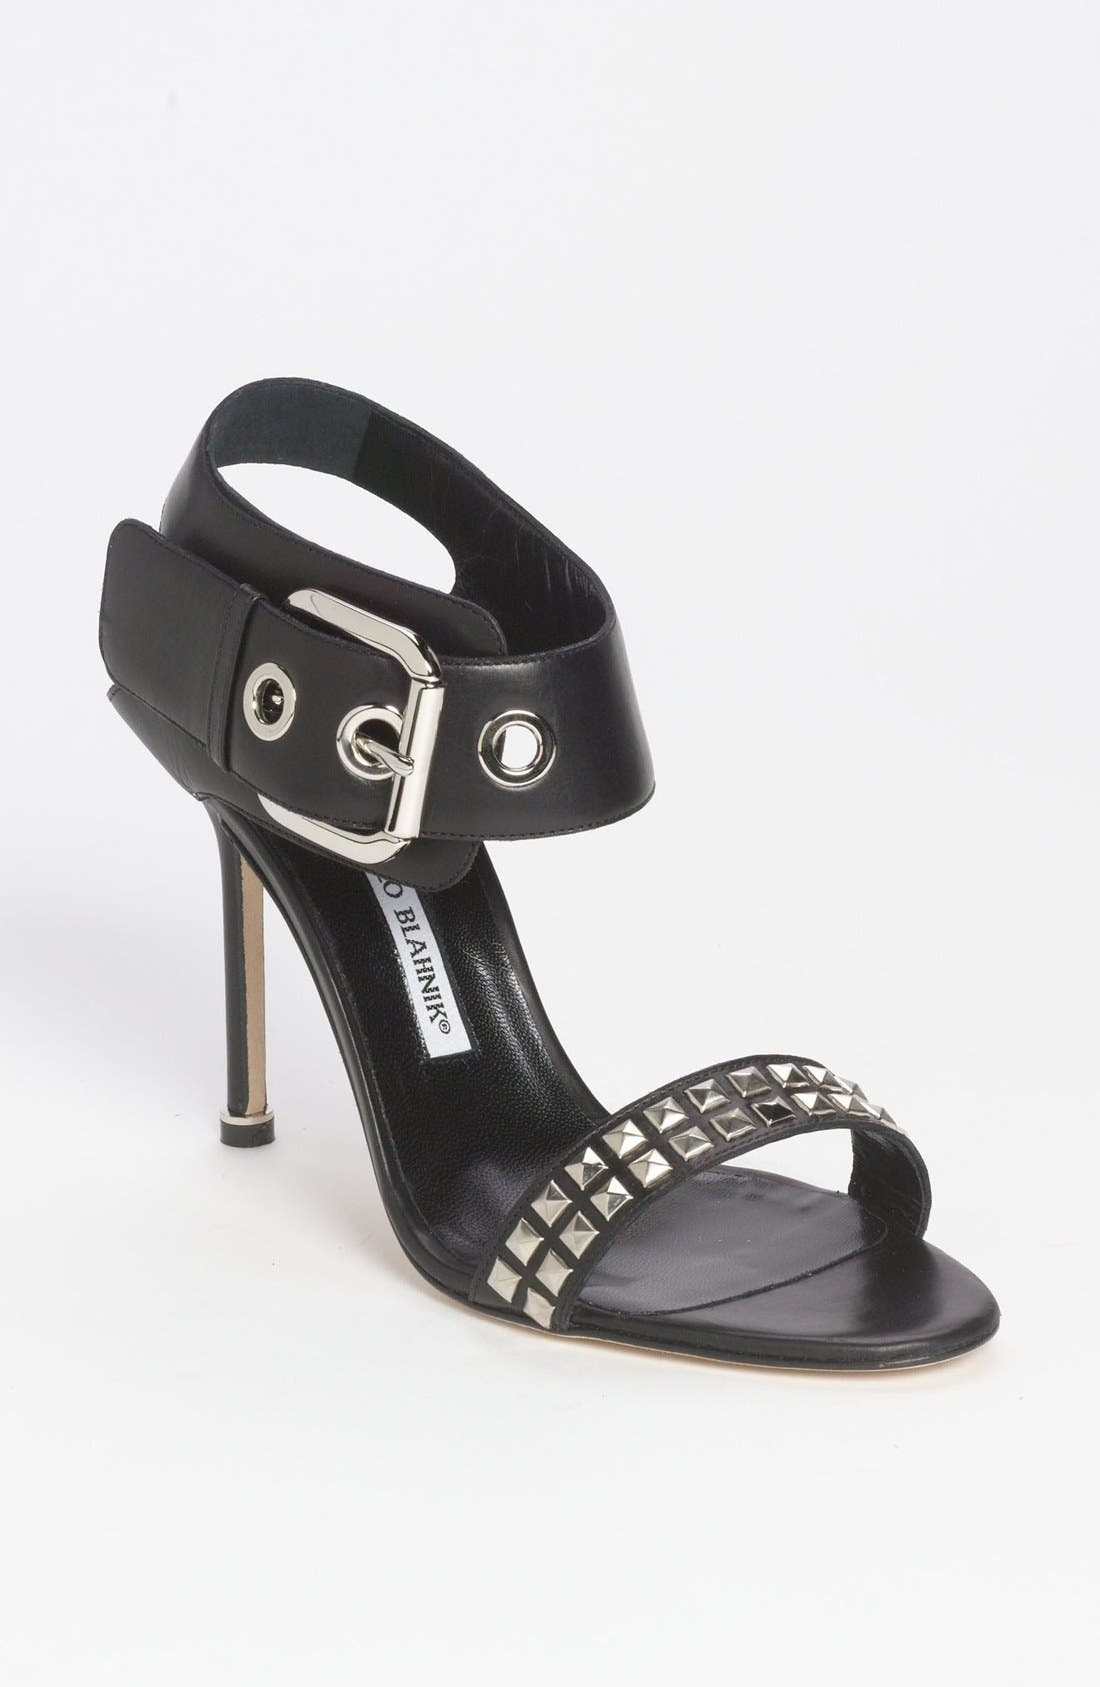 Main Image - Manolo Blahnik 'Koyro' Sandal